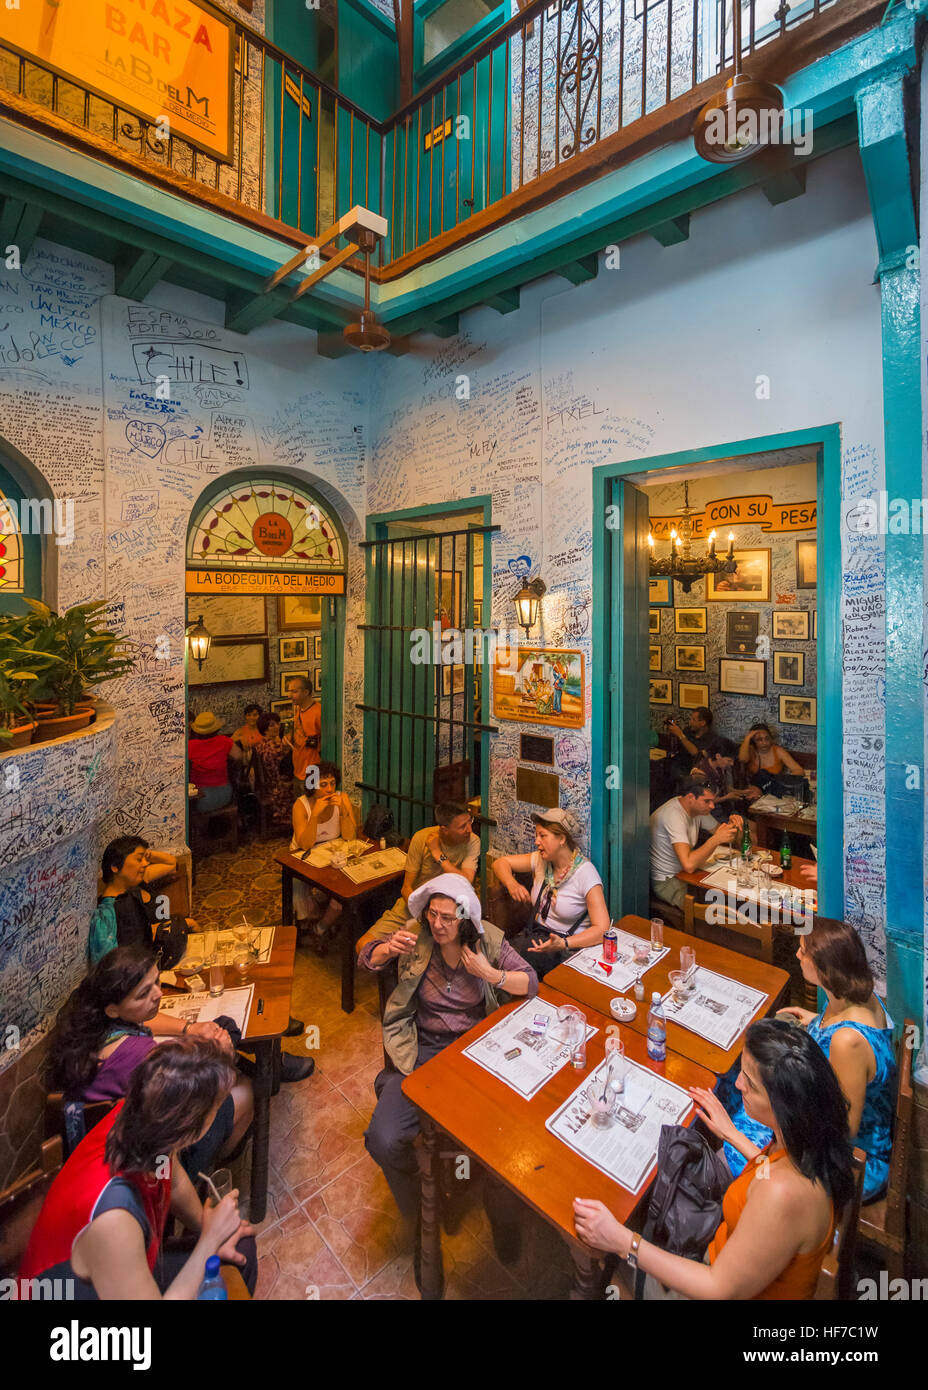 Havanna, Kuba. La Bodeguita del Medio, bar, die lokale hat starke Ernest Hemingway Verbindungen, Habana Vieja, Havanna, Stockbild